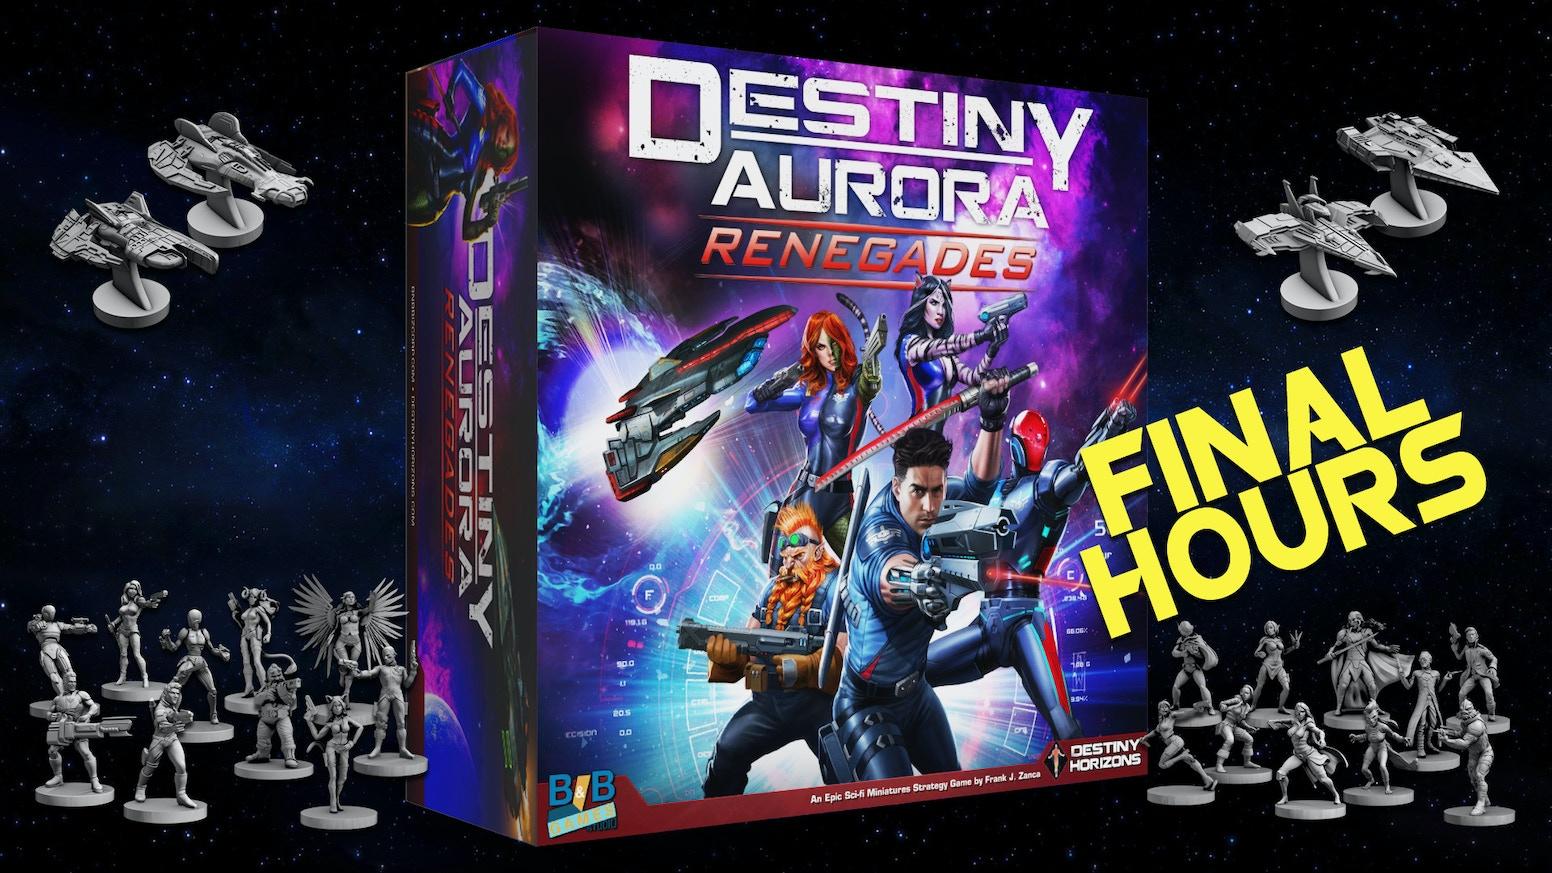 Destiny Aurora: Renegades is a uniquely immersive sci-fi game miniatures Board Game